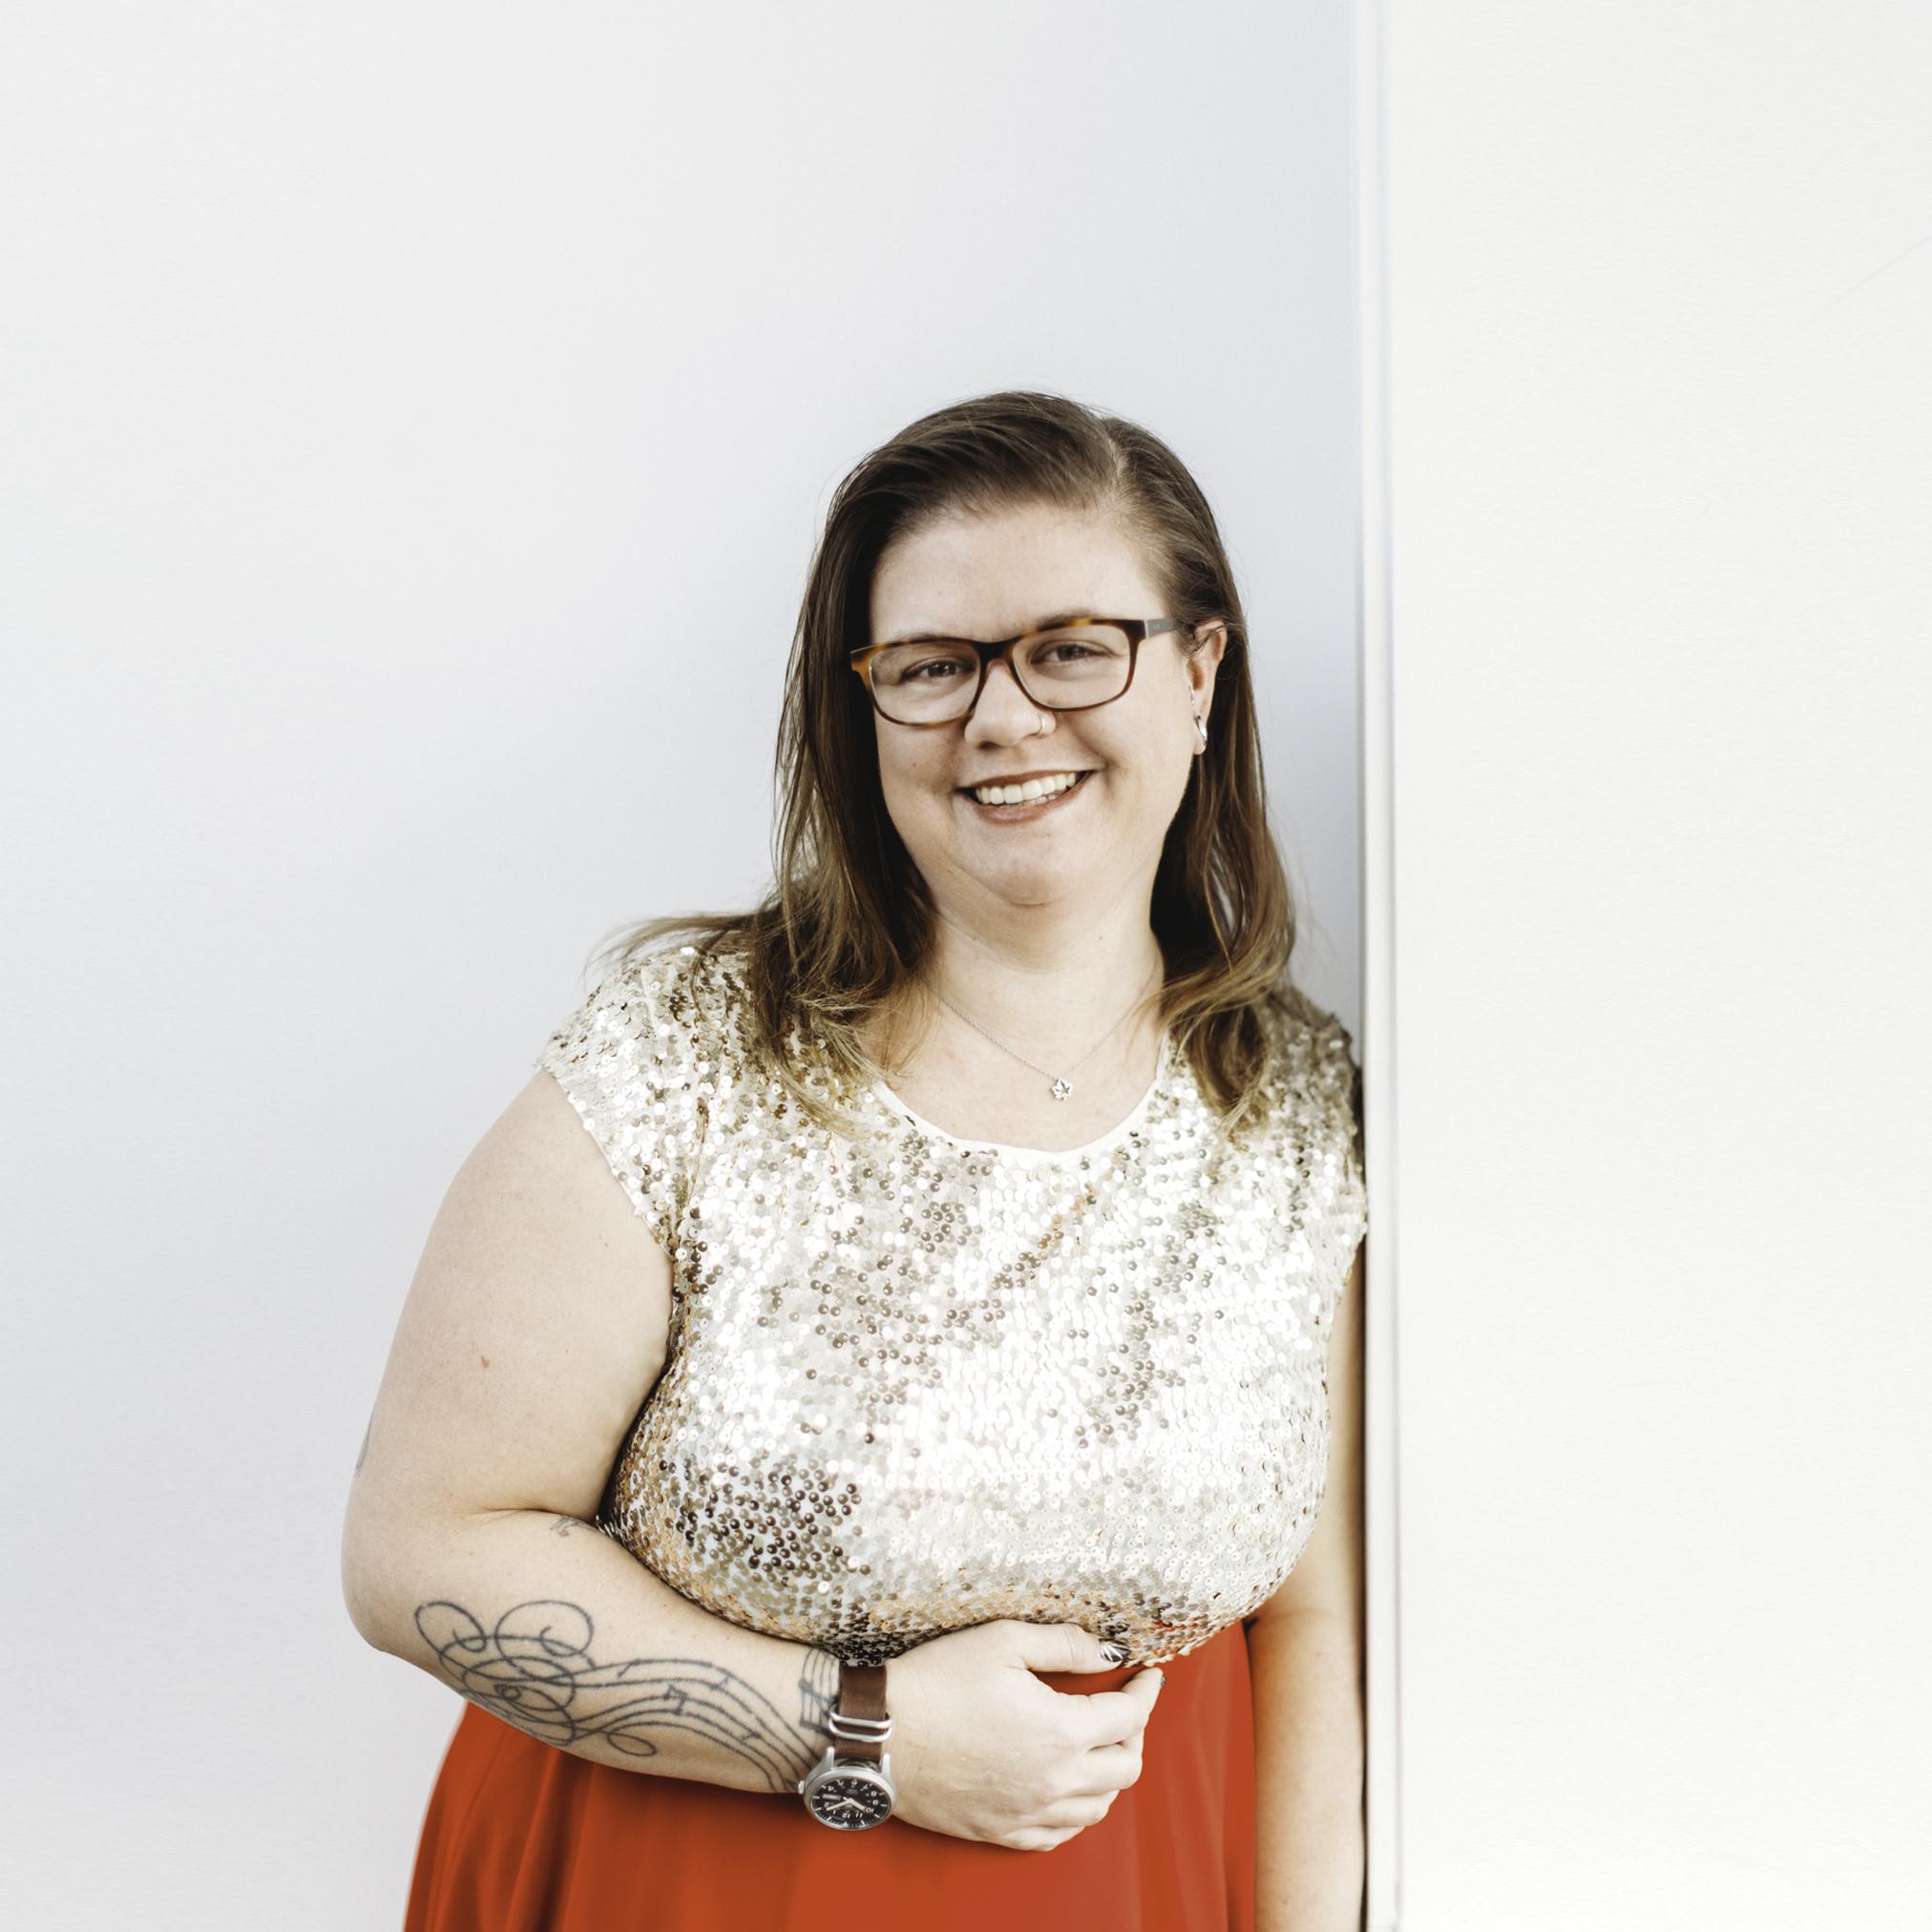 Kristin Hartigan   Urban Prairie Digital Founder and Educator   Instagram  |  Website  |  Facebook